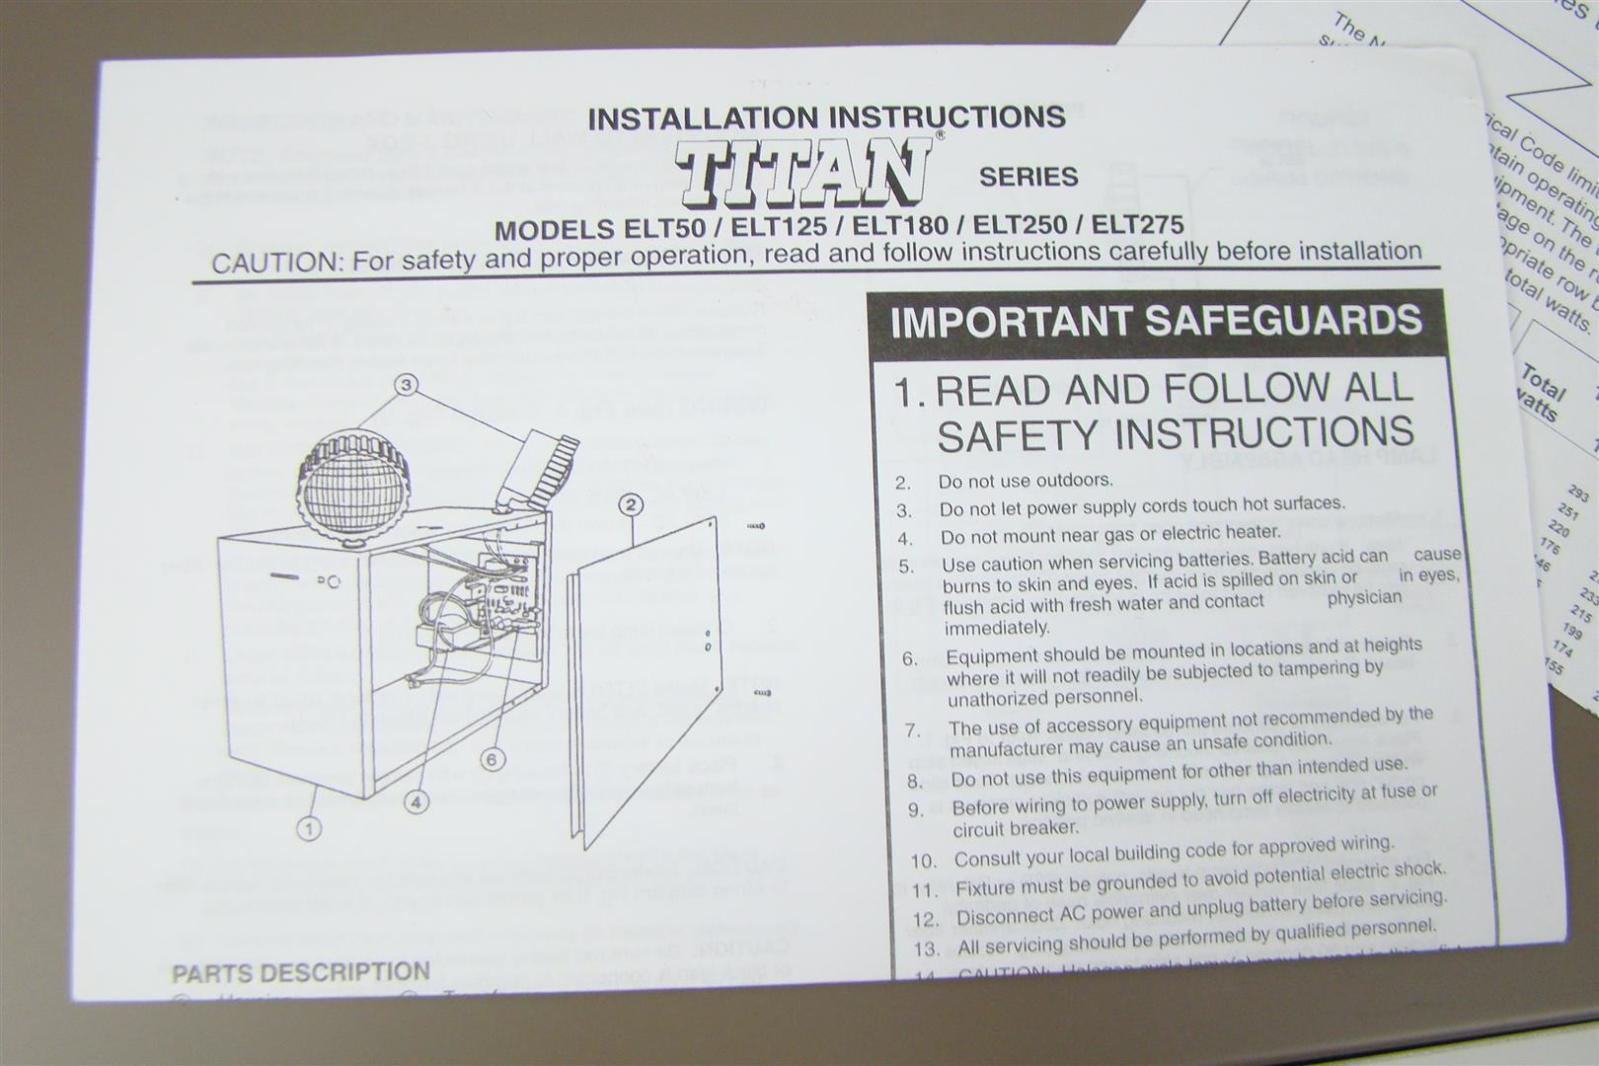 Lithonia Titan Battery Powered Emergency Light 125w 12v Elt125lb Ebay Lighting Wiring Diagram